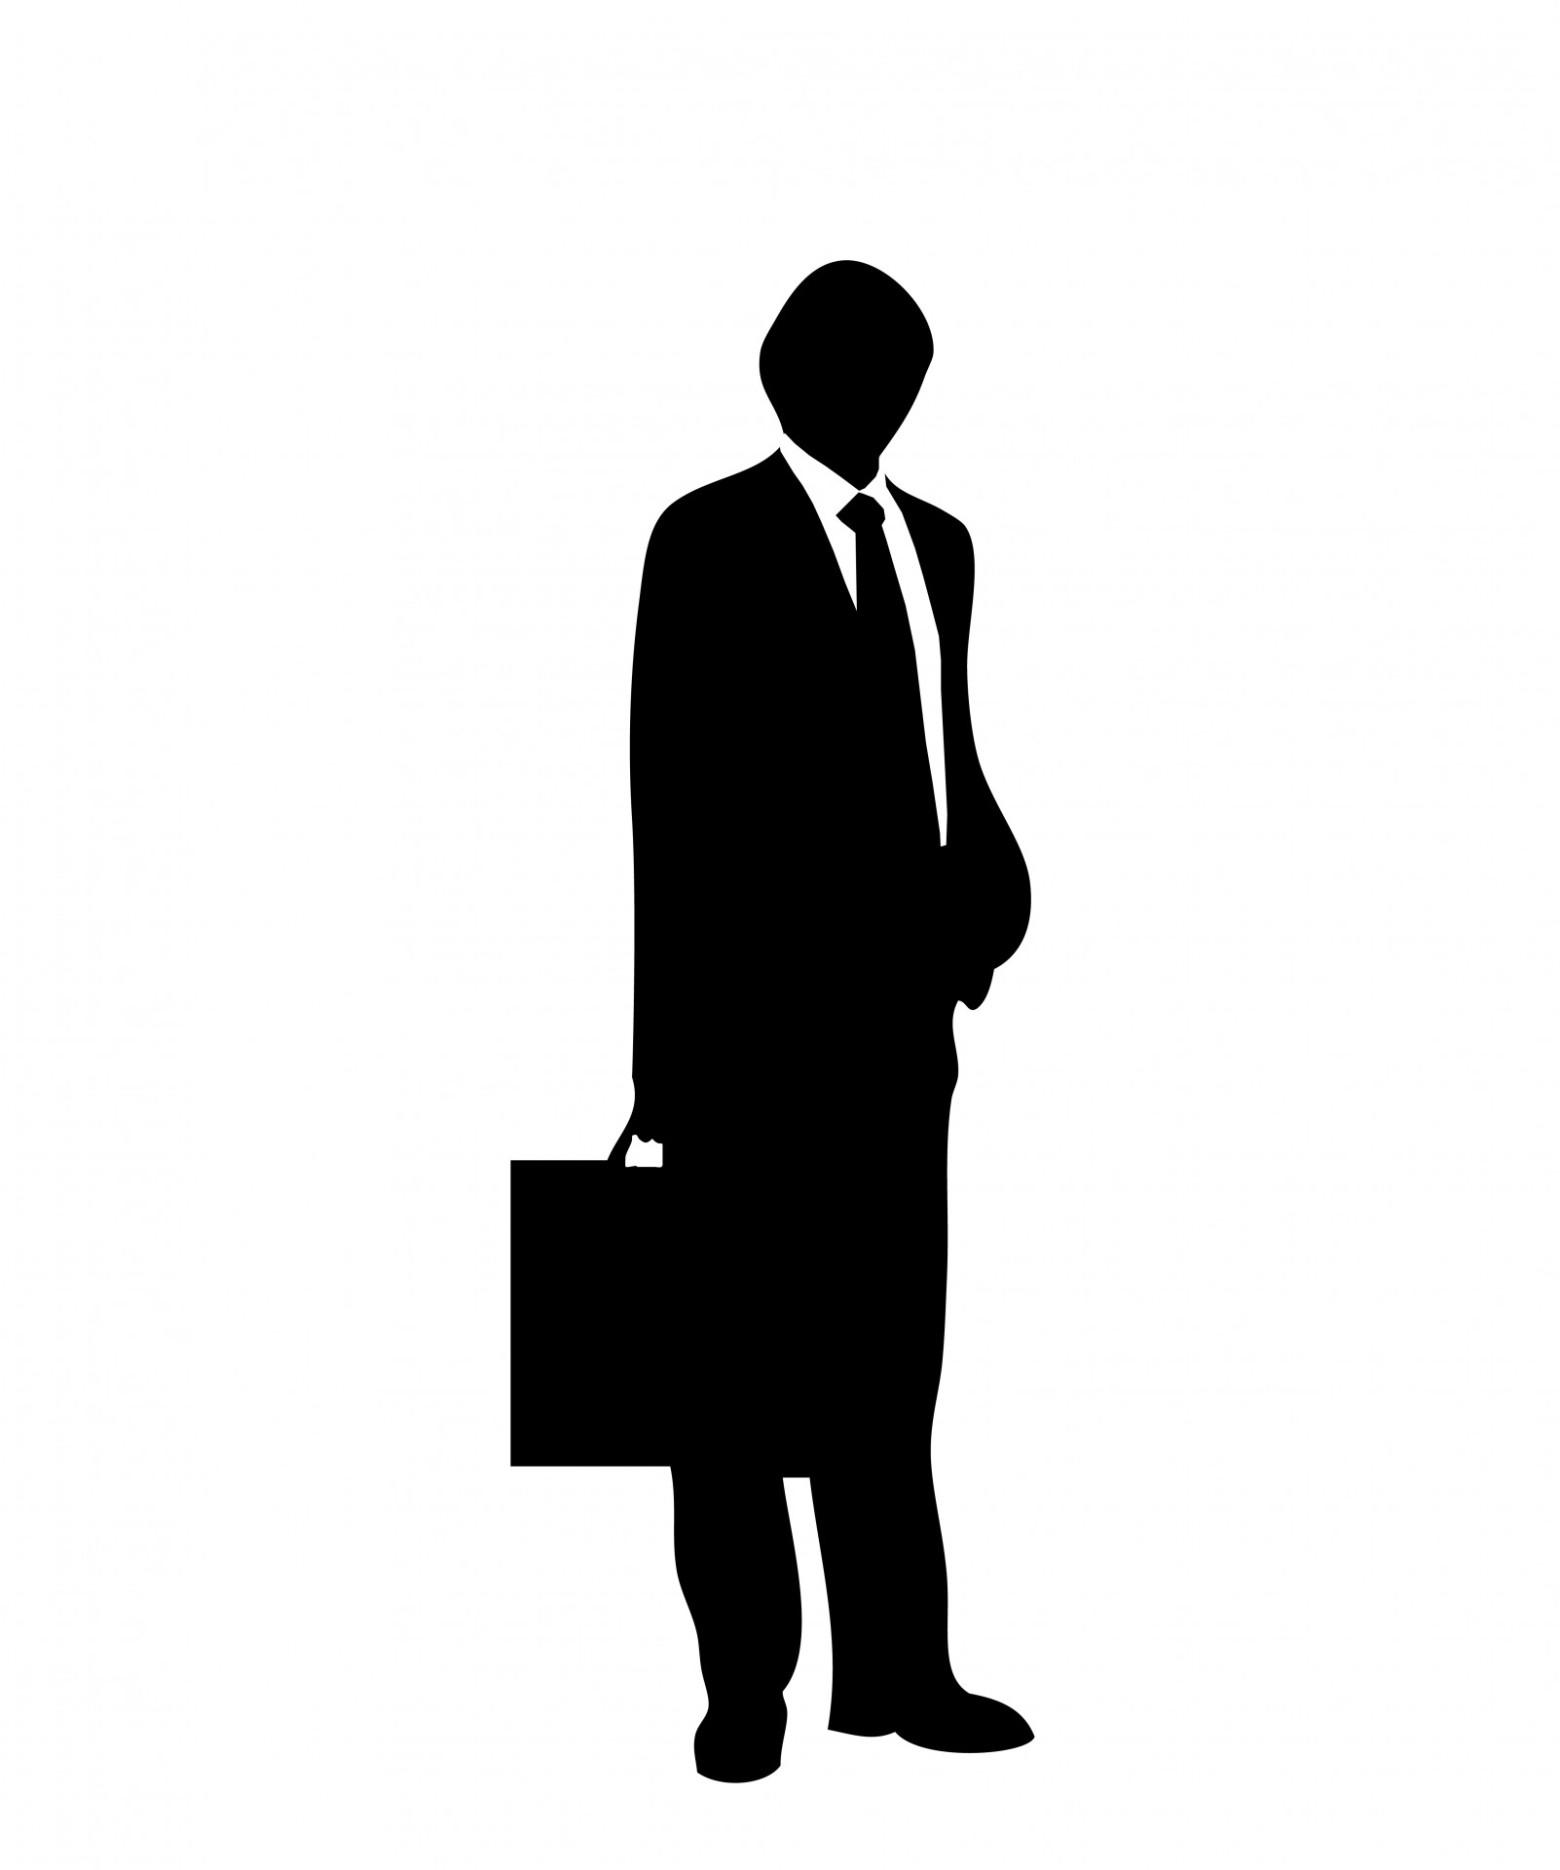 homme homme d affaires business businessman illustration vecteur isol sur fond blanc. Black Bedroom Furniture Sets. Home Design Ideas